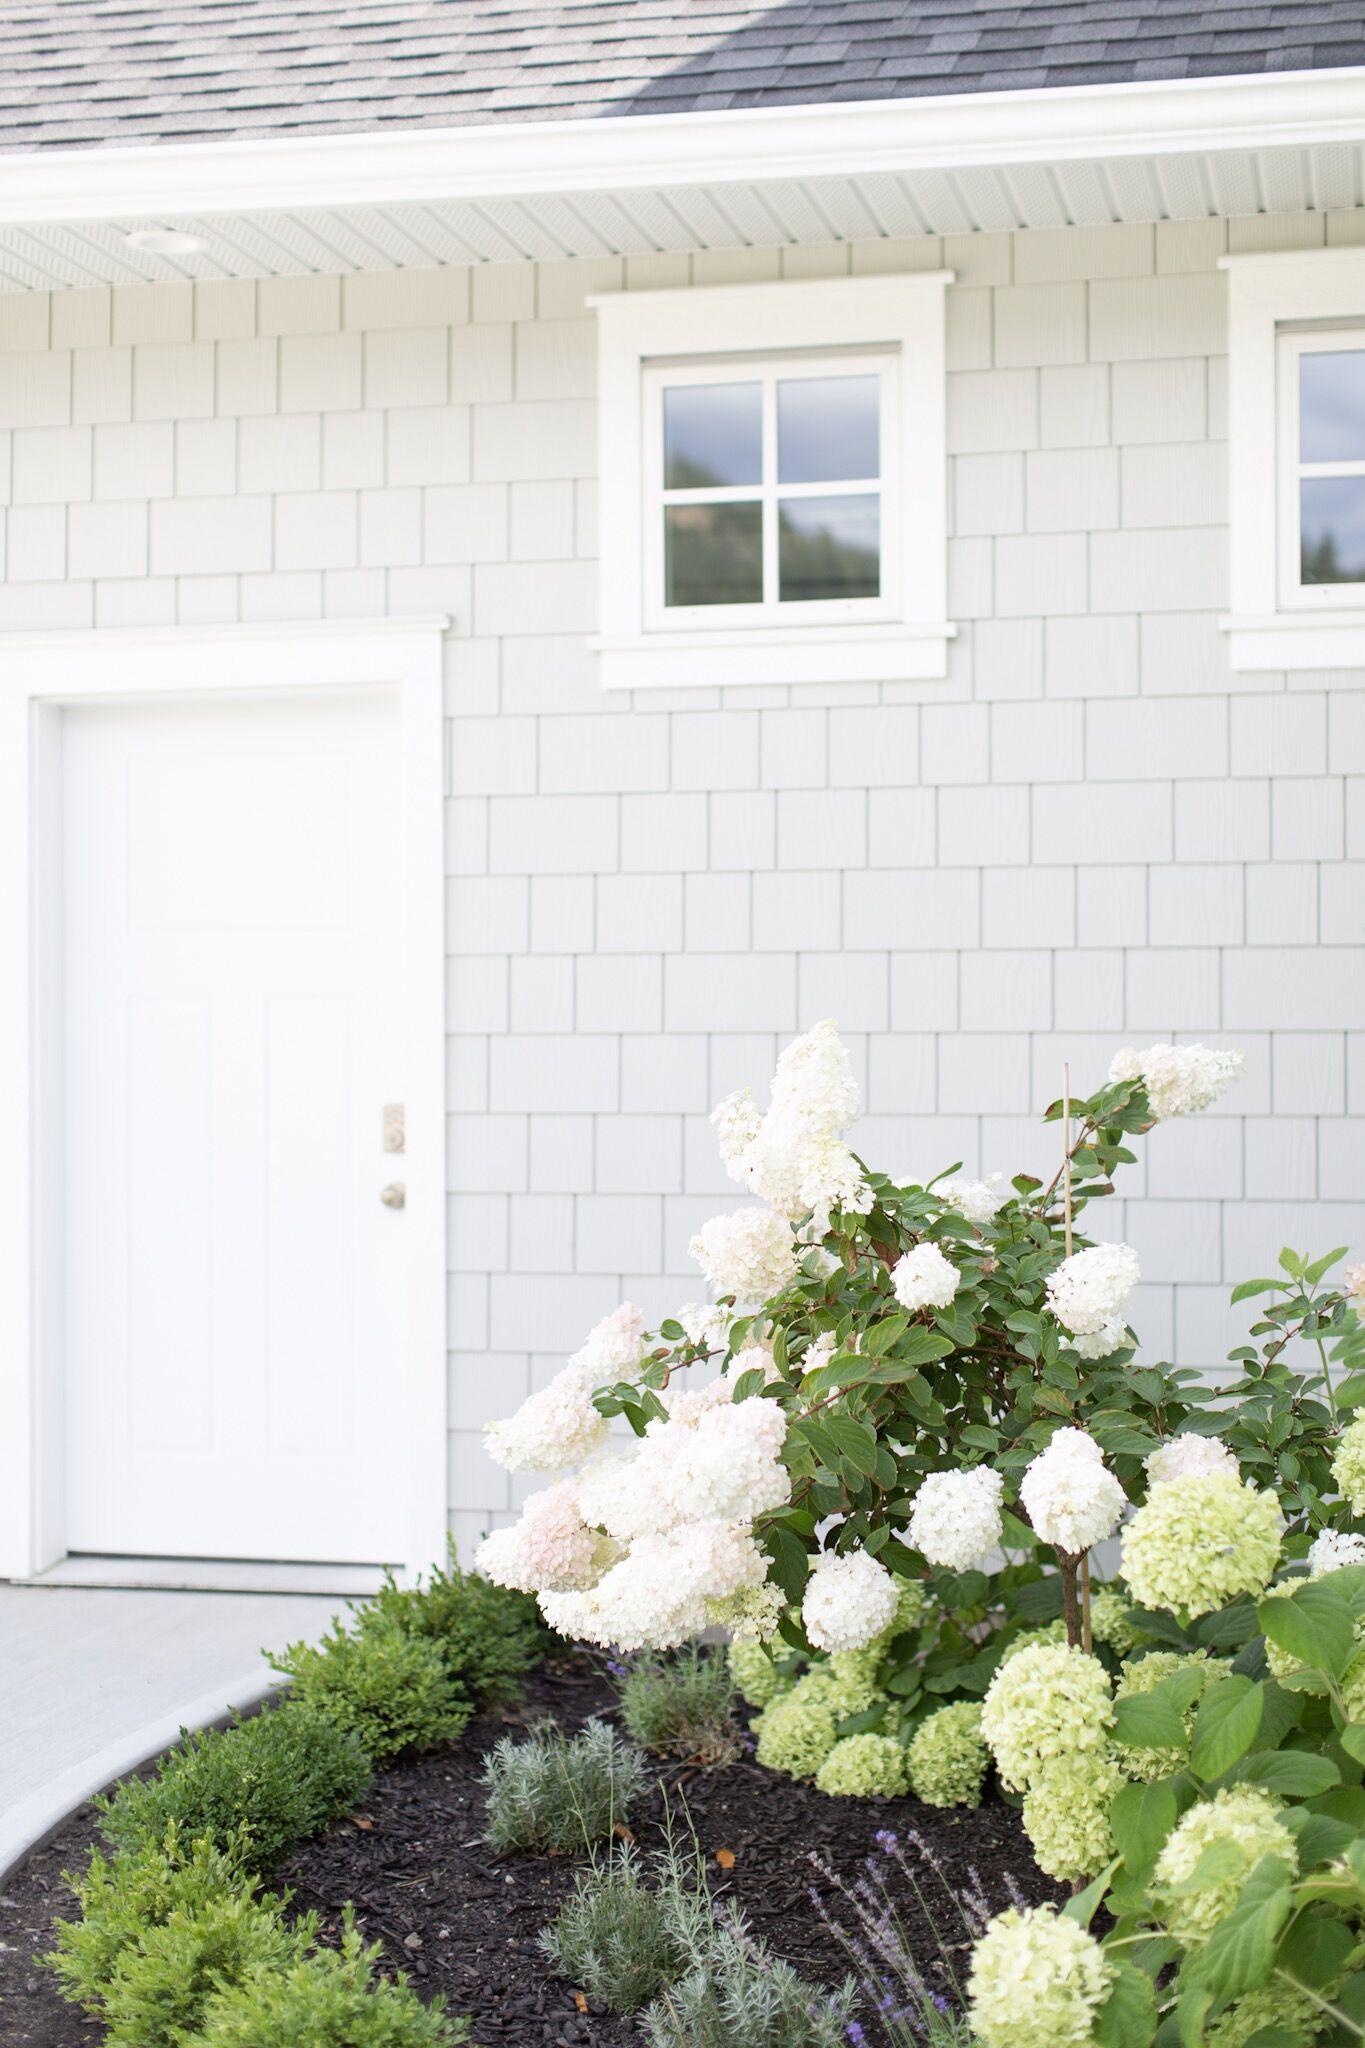 Tori Wesszer's exterior house reveal